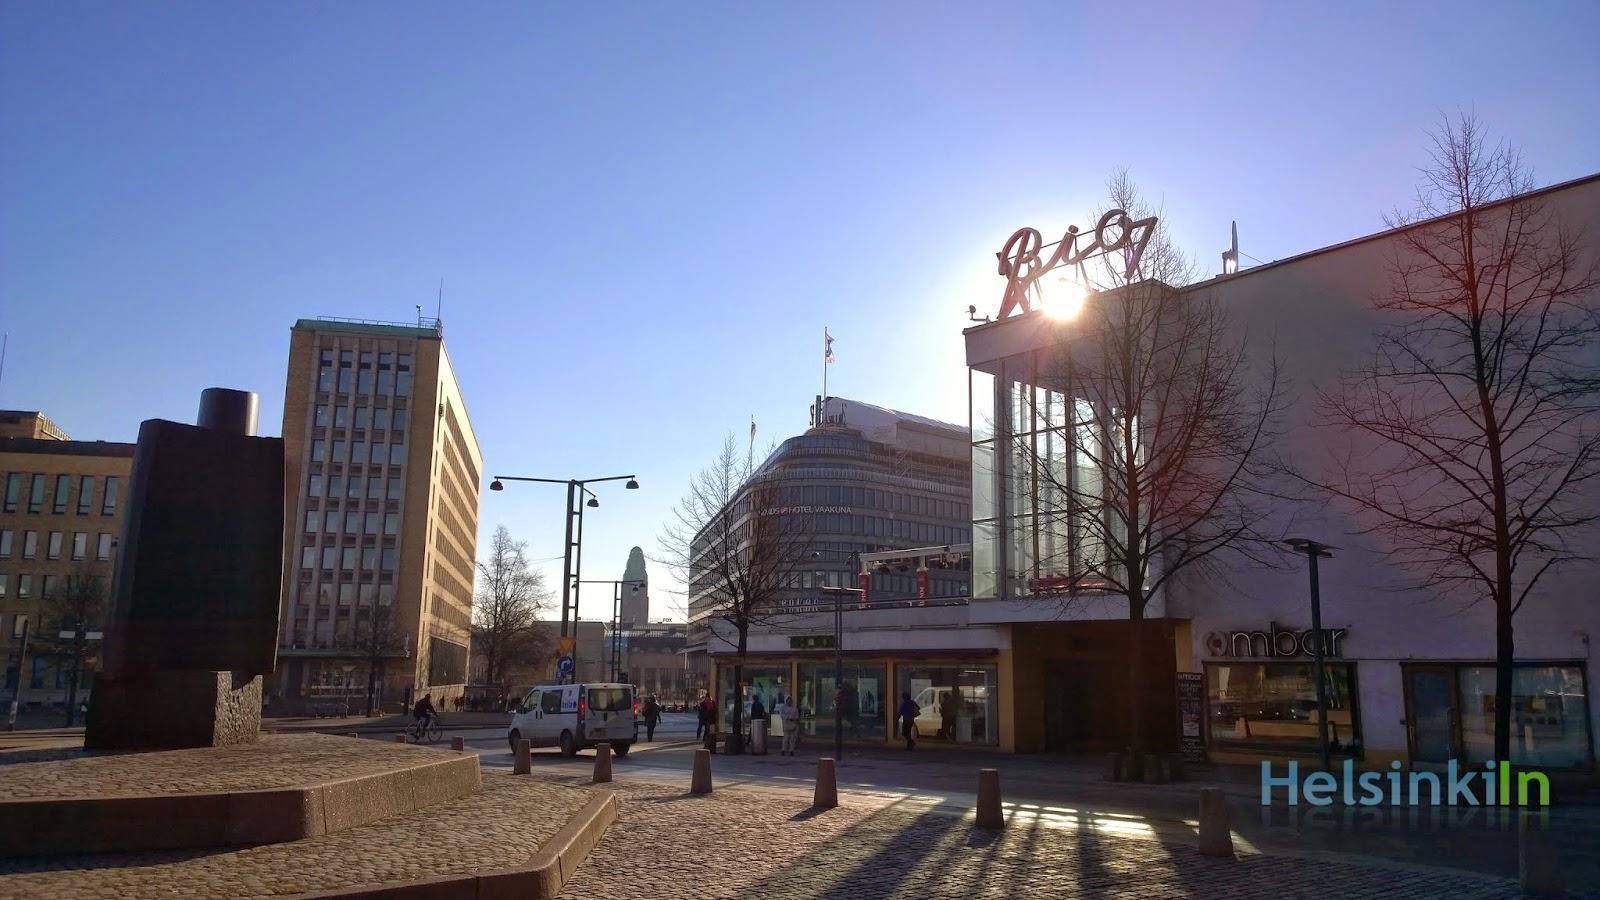 Sunny Helsinki on a weekday morning